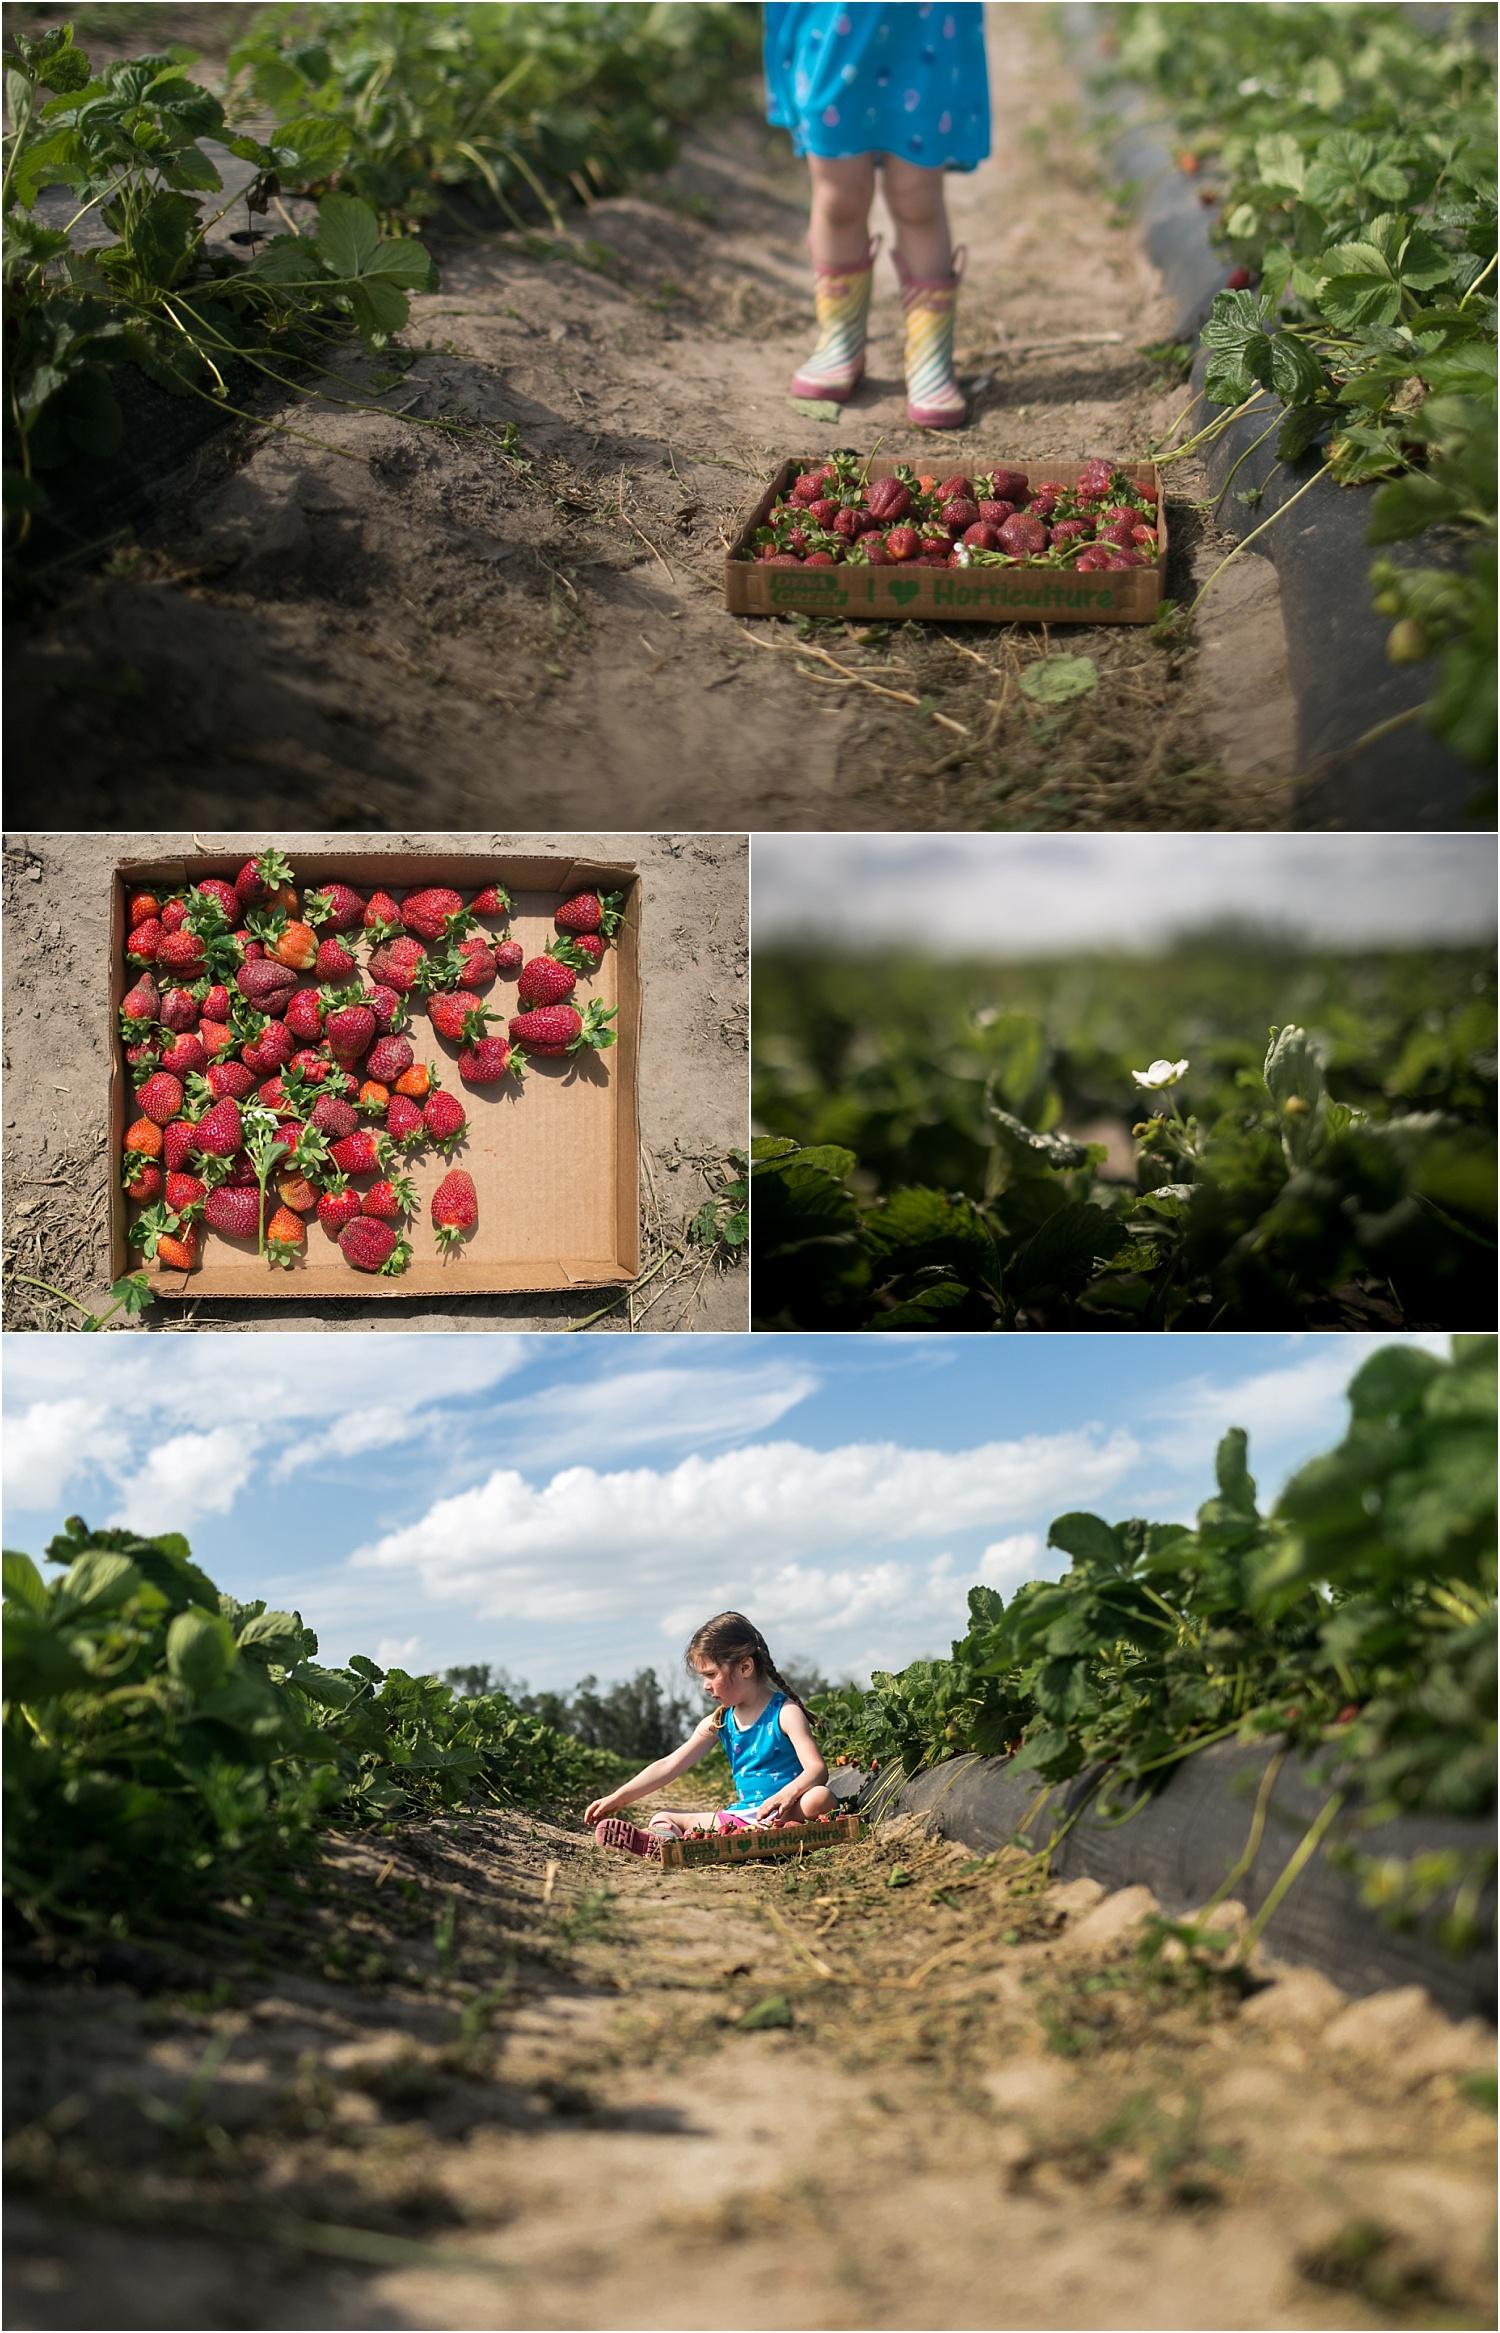 Gathering and picking strawberries at A & H Farm in Manhattan, Kansas